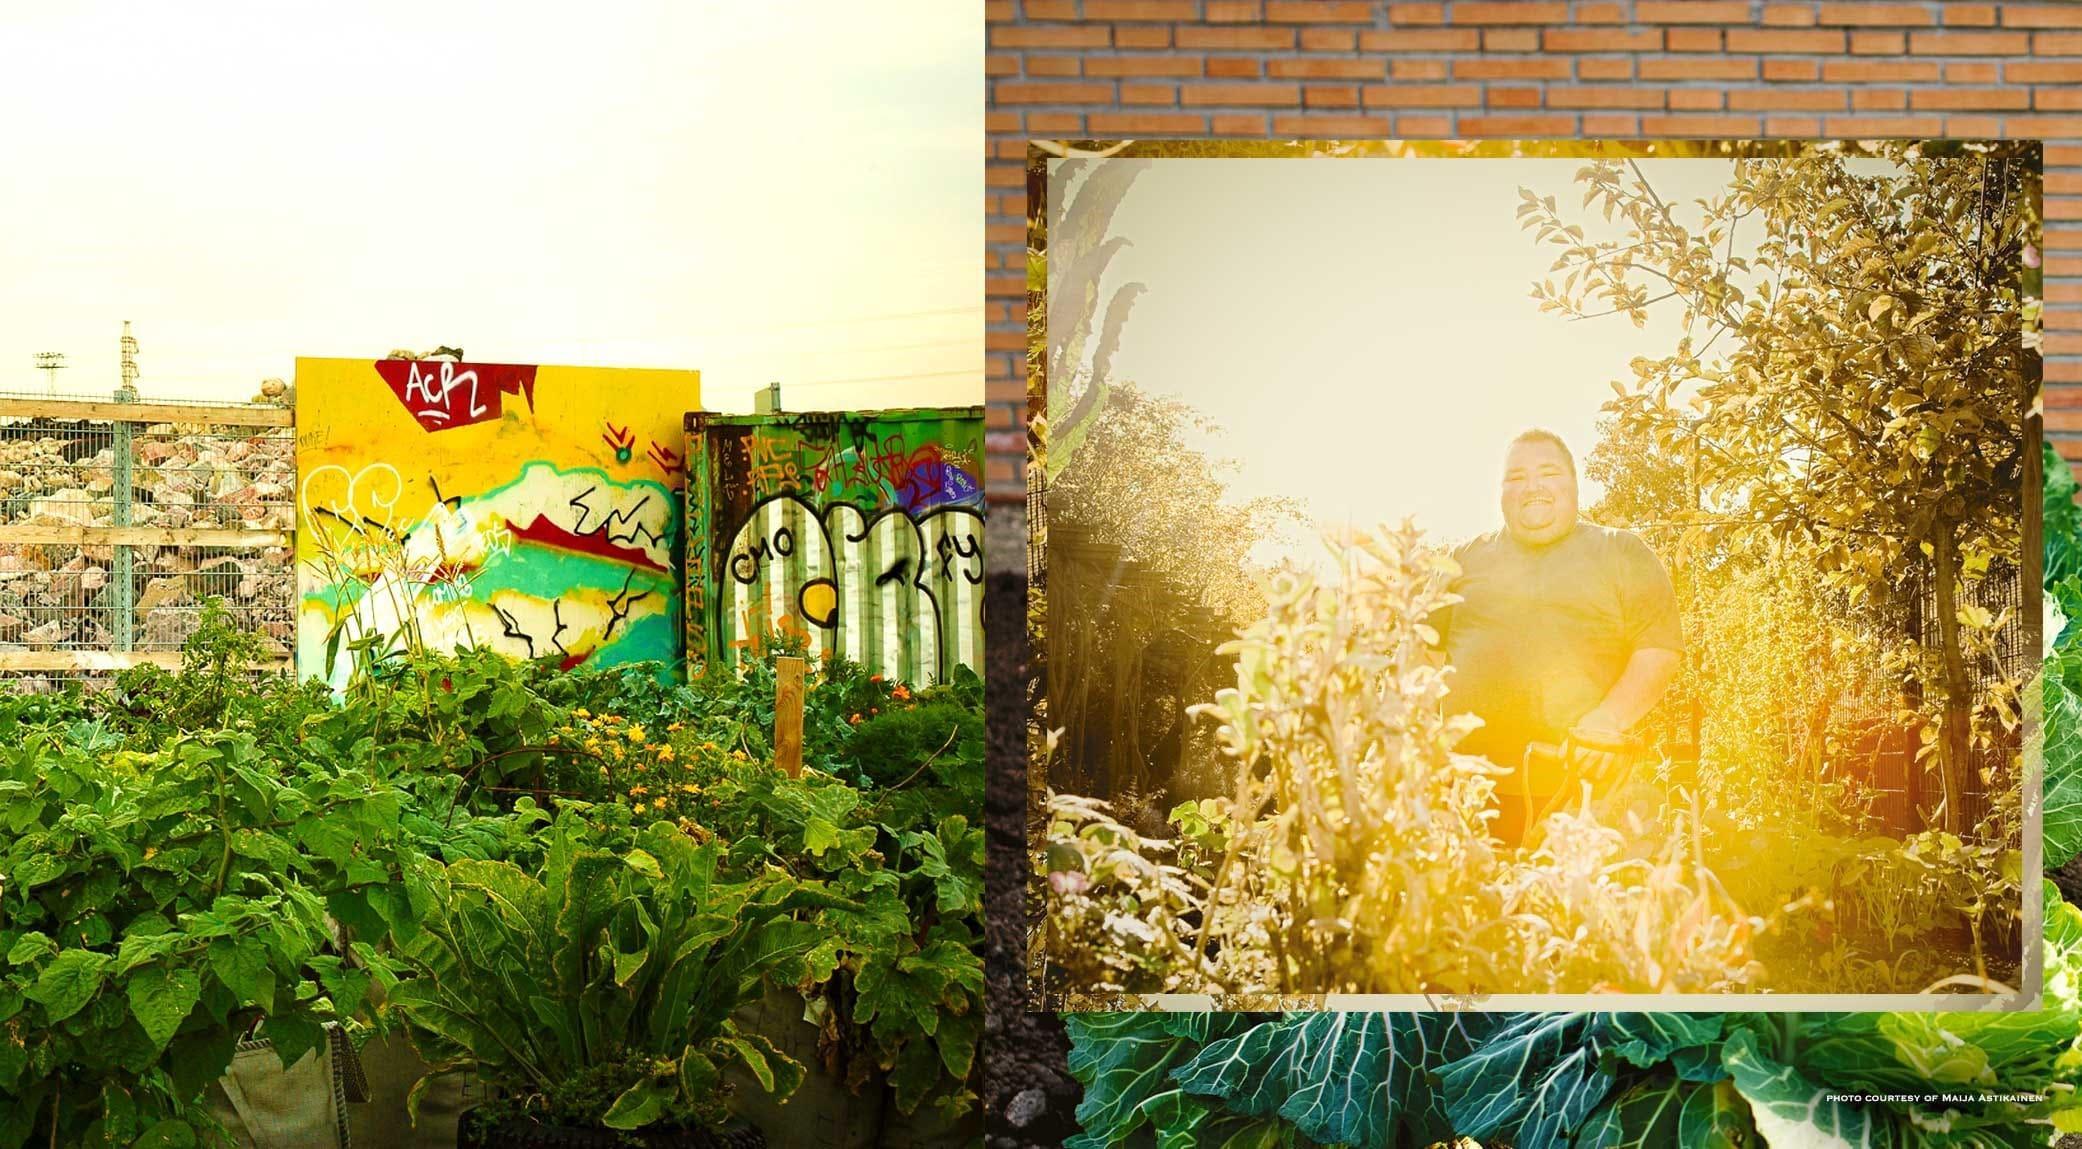 original_007-Horticultured-Cities-finedininglovers.jpg